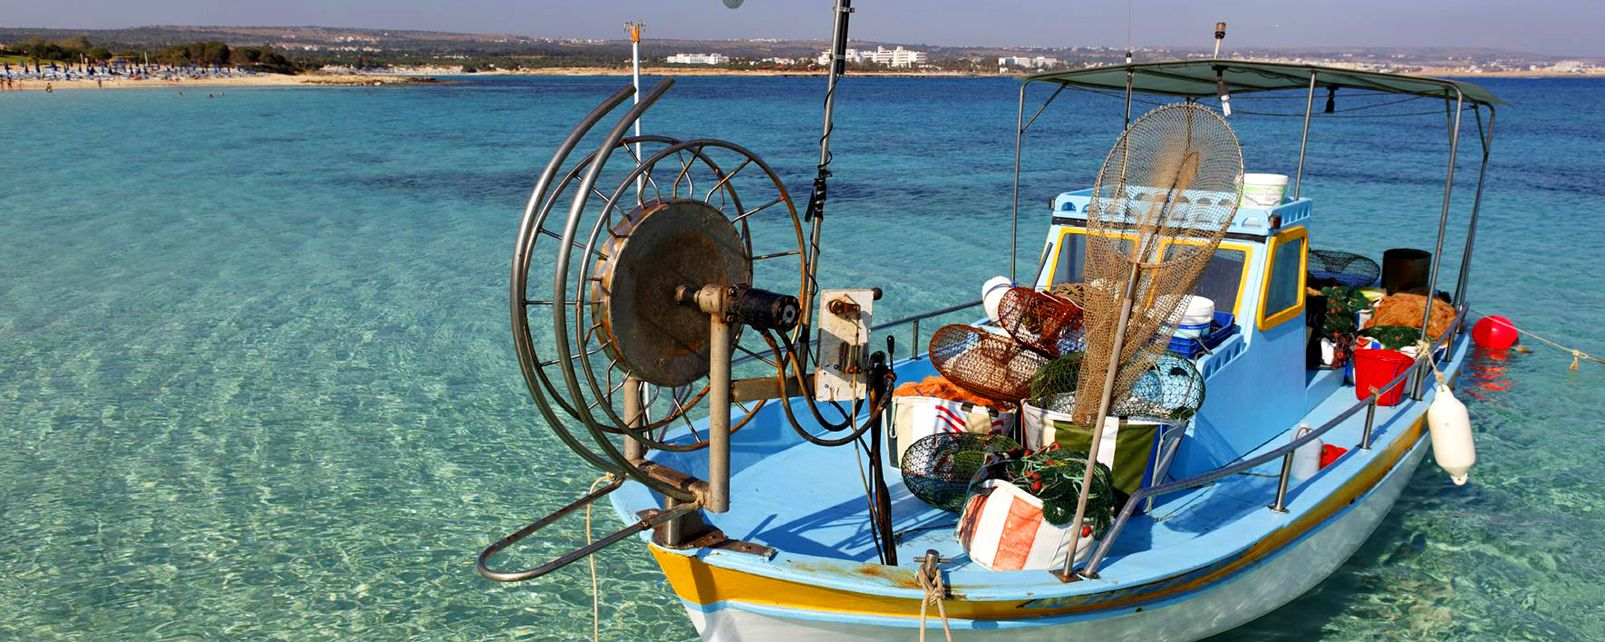 La région d'Agia Napa , Agia Napa , Chypre